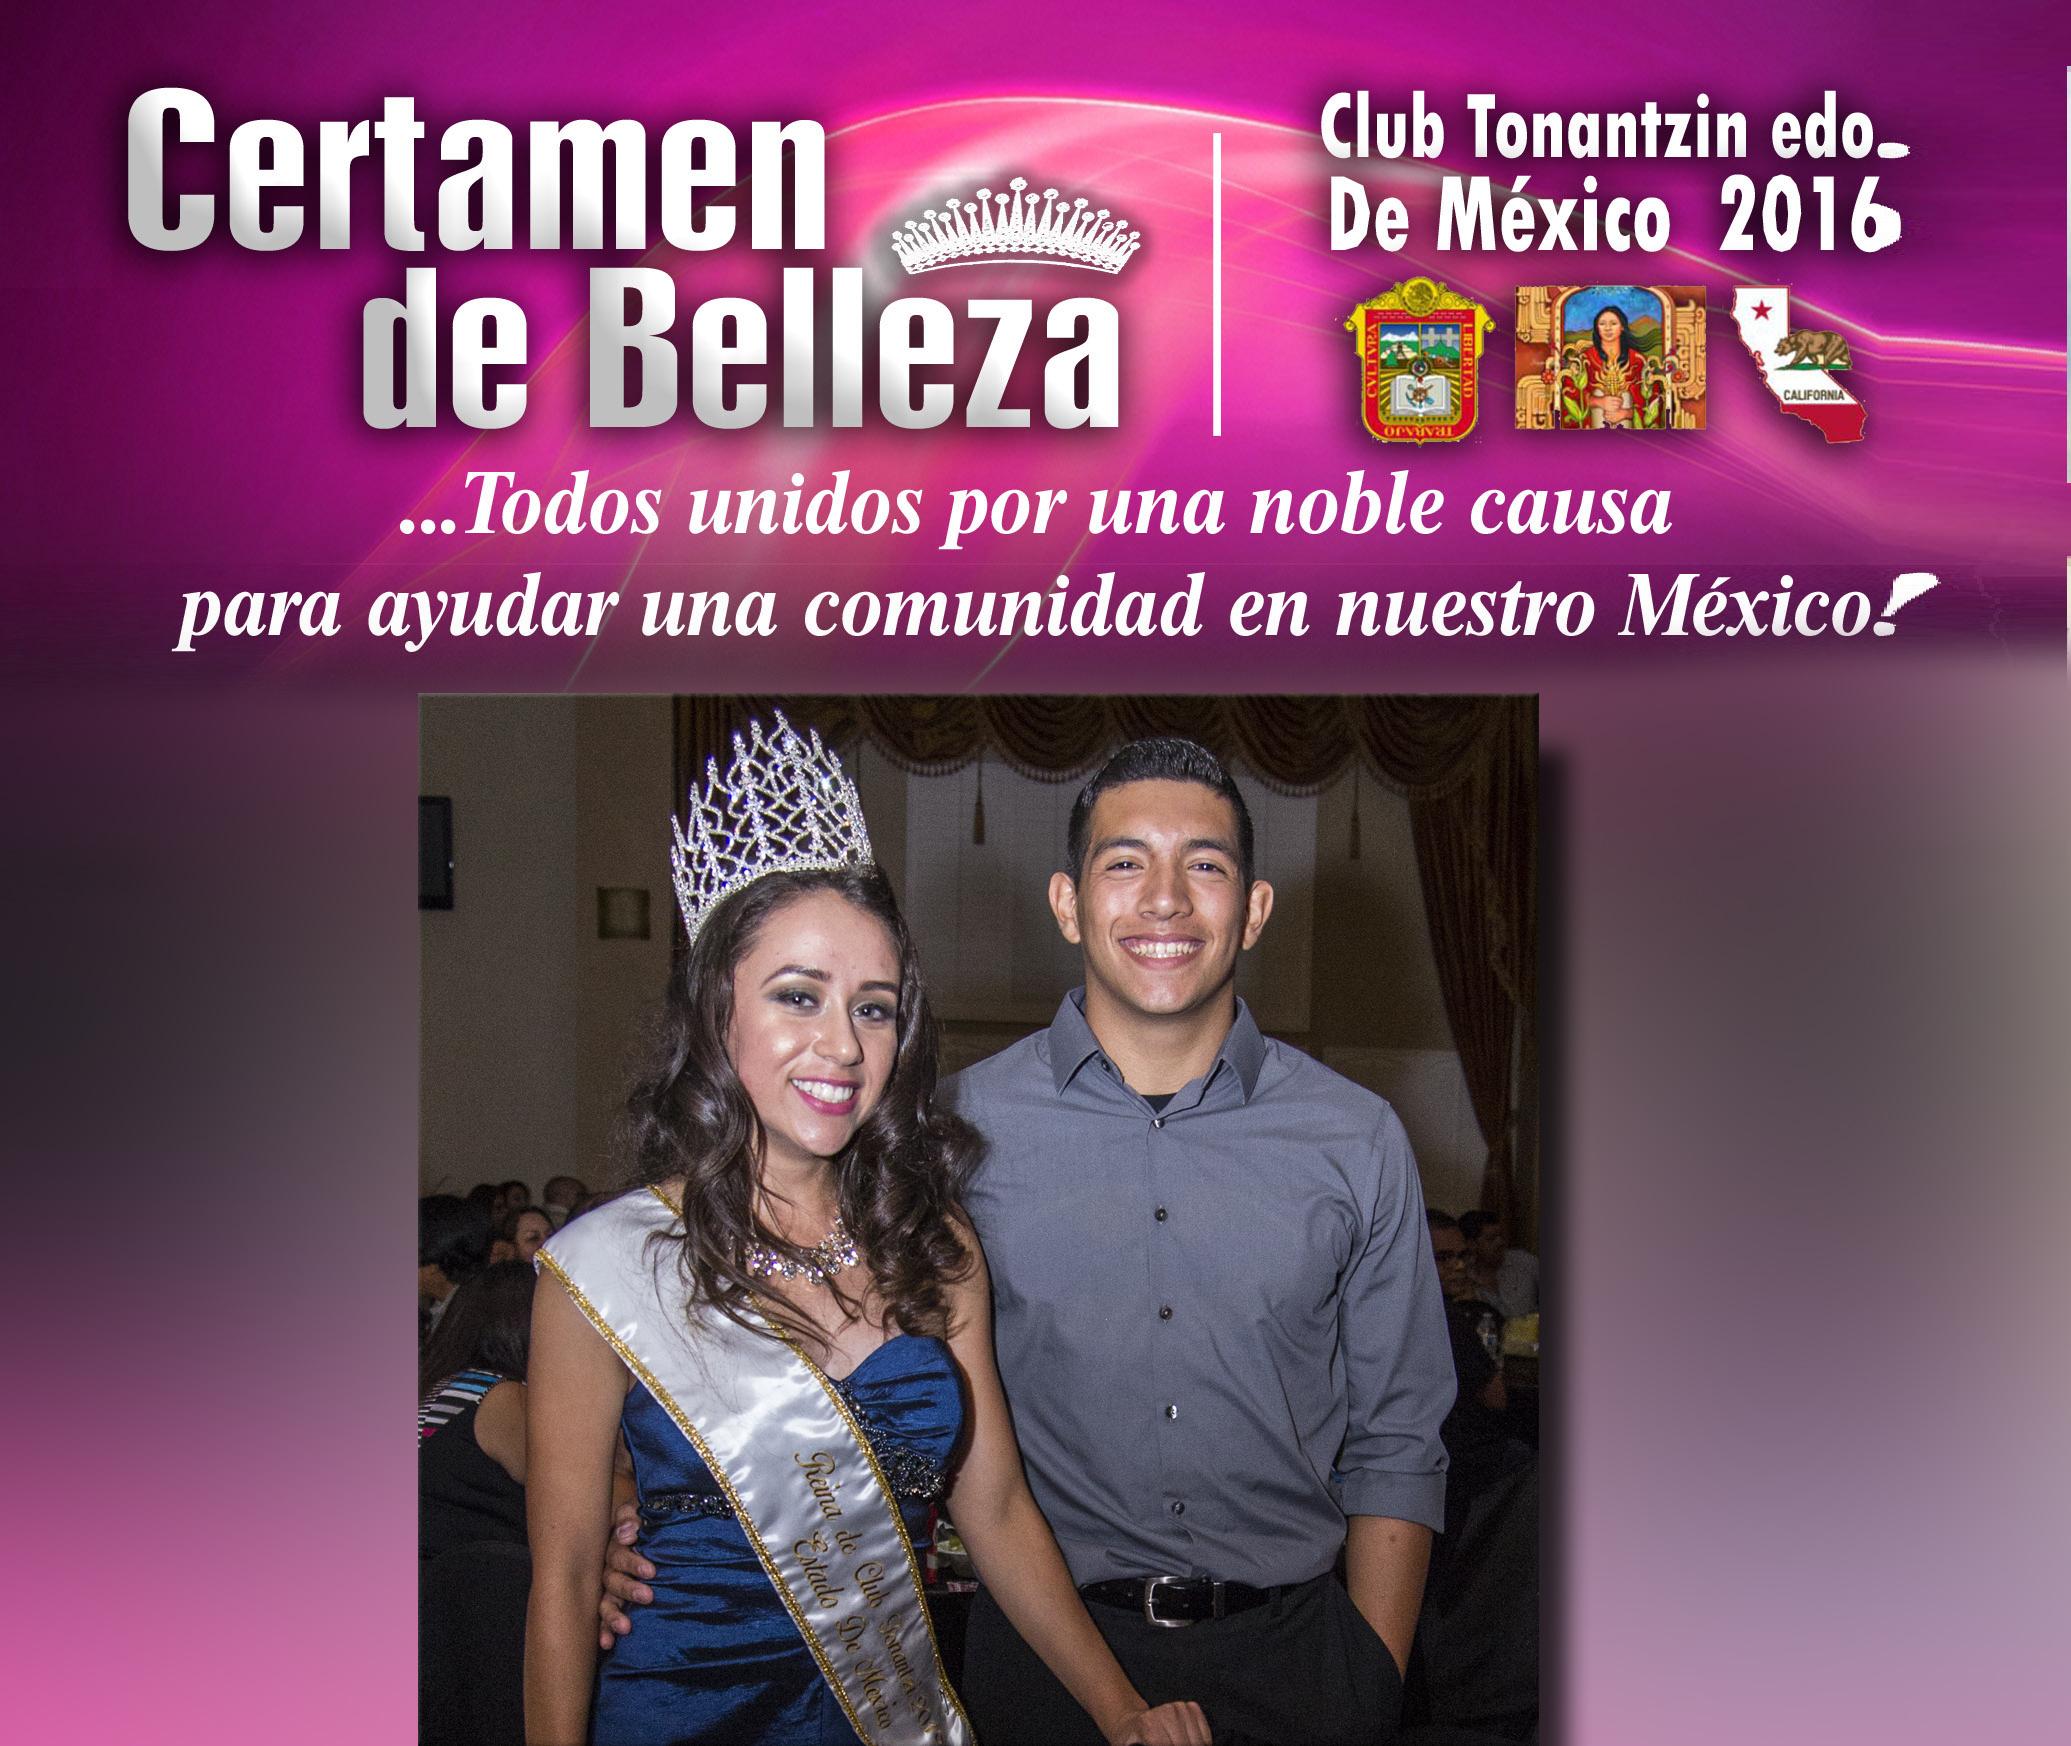 Culminó Con Gran Exito El Certamen De Belleza Edo De México, Club Tonantzin